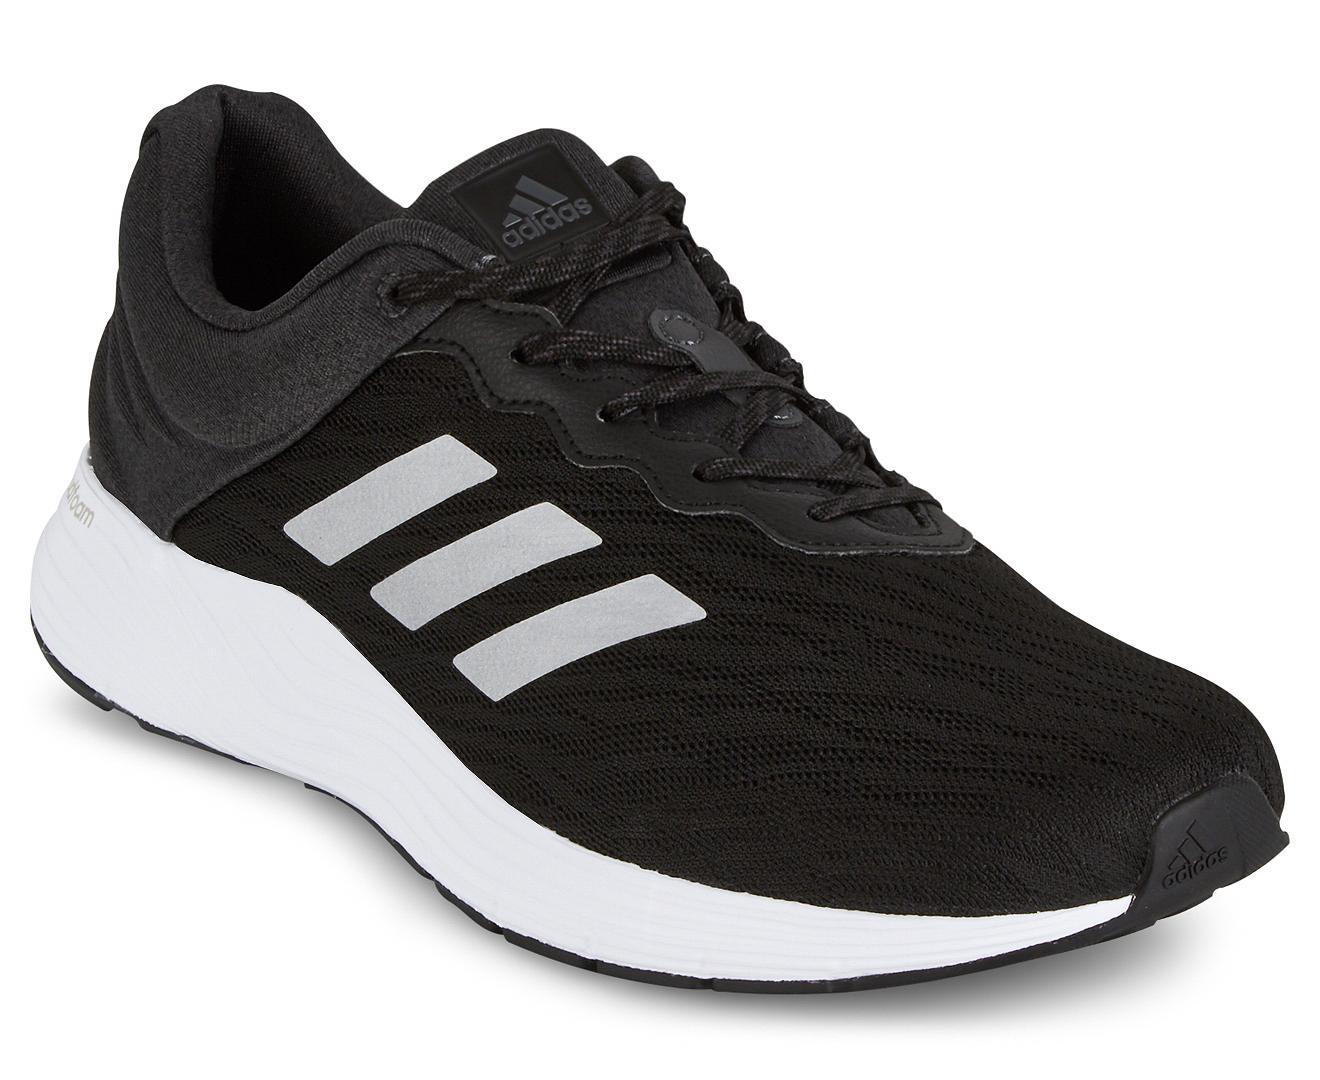 Adidas Fluid Cloud Shoes